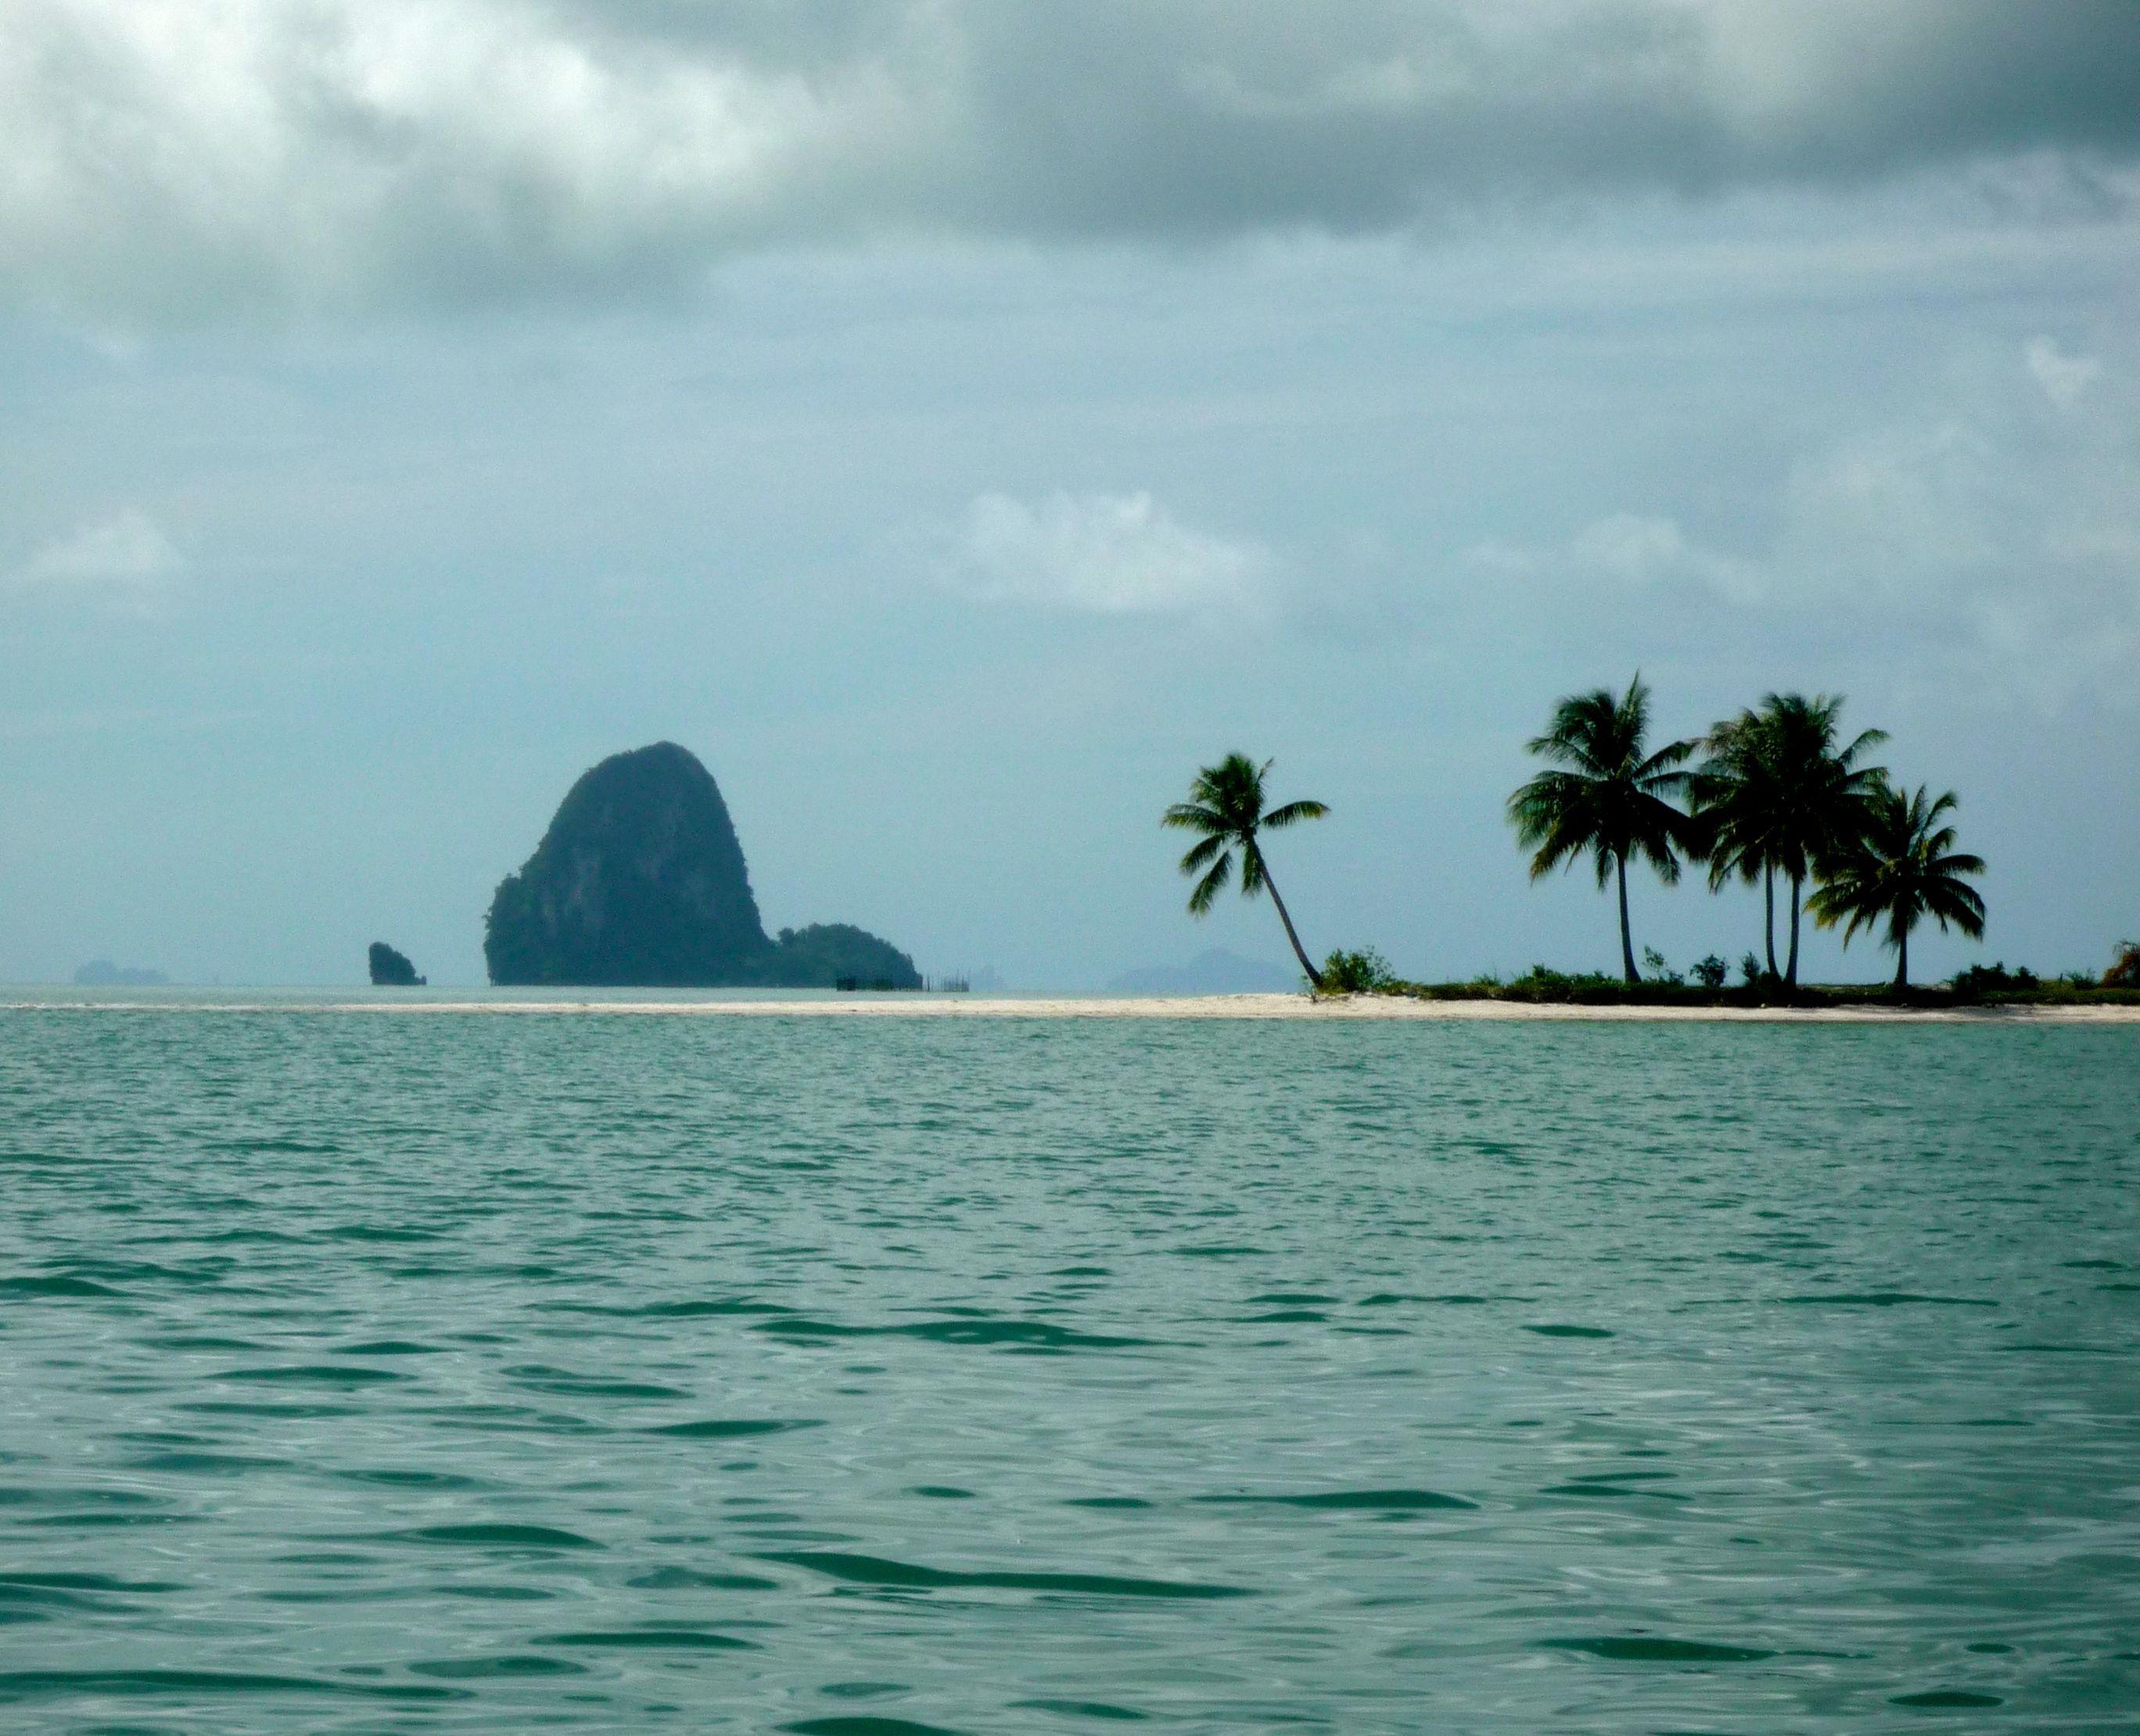 Onbewoond eiland bij Koh Yao Yai